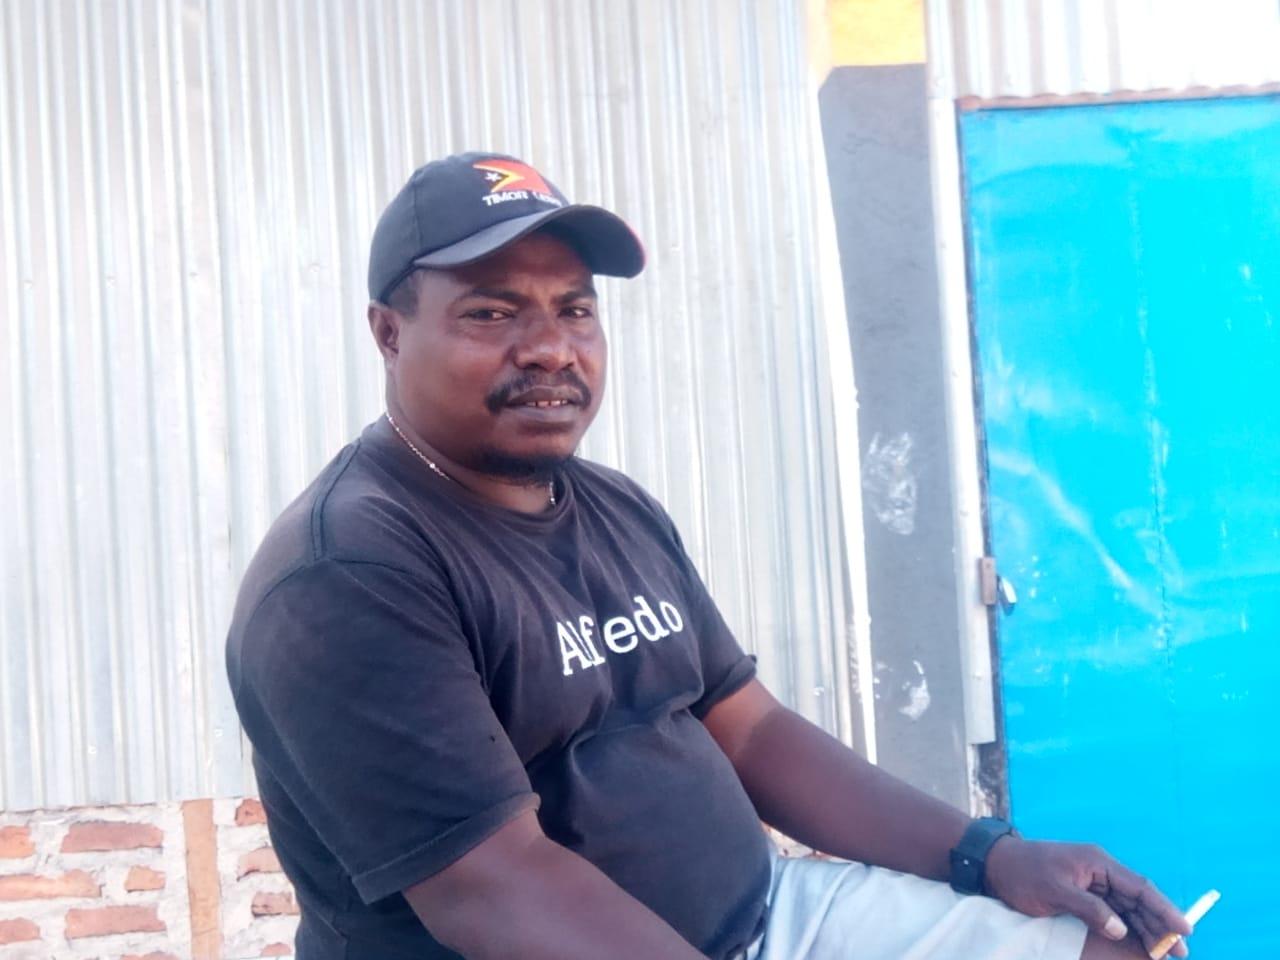 Francis Sailana, Calaon Kepala Desa nomor urut 1 yang melaporkan Dugaan Penggelembungan Suara di Pilkades Langkuru Utara (Sumber Foto : Gitur)